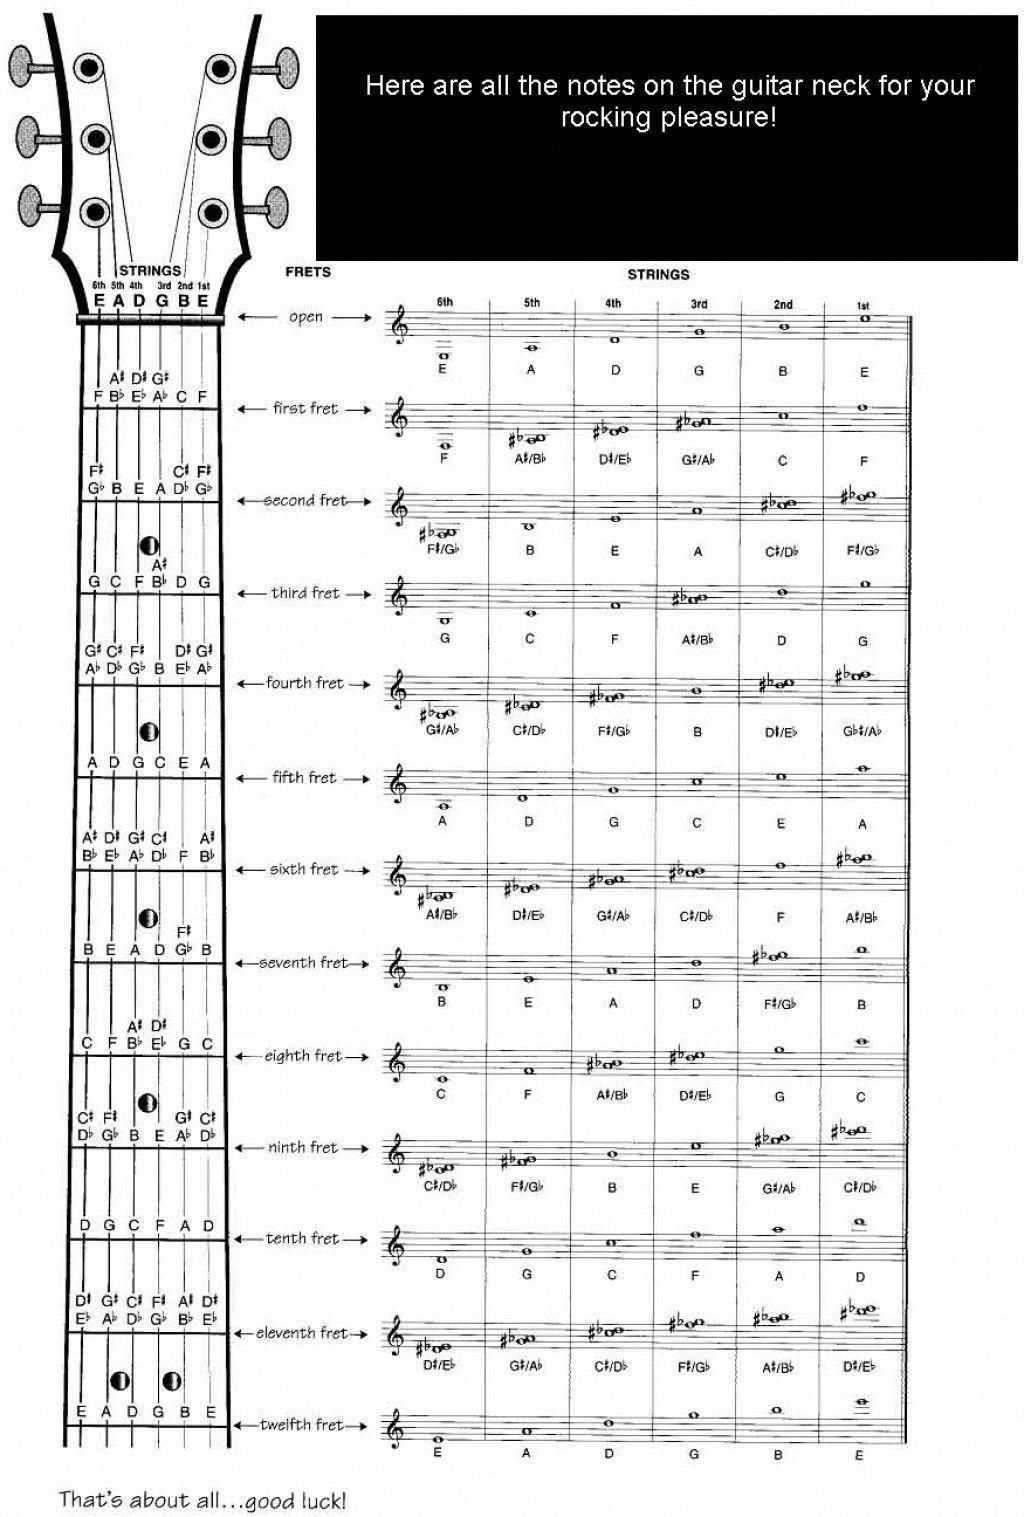 Guitar Tutorials Guitartutorials Guitar Chords Beginner Music Guitar Guitar Fretboard How to read guitar chords for beginners